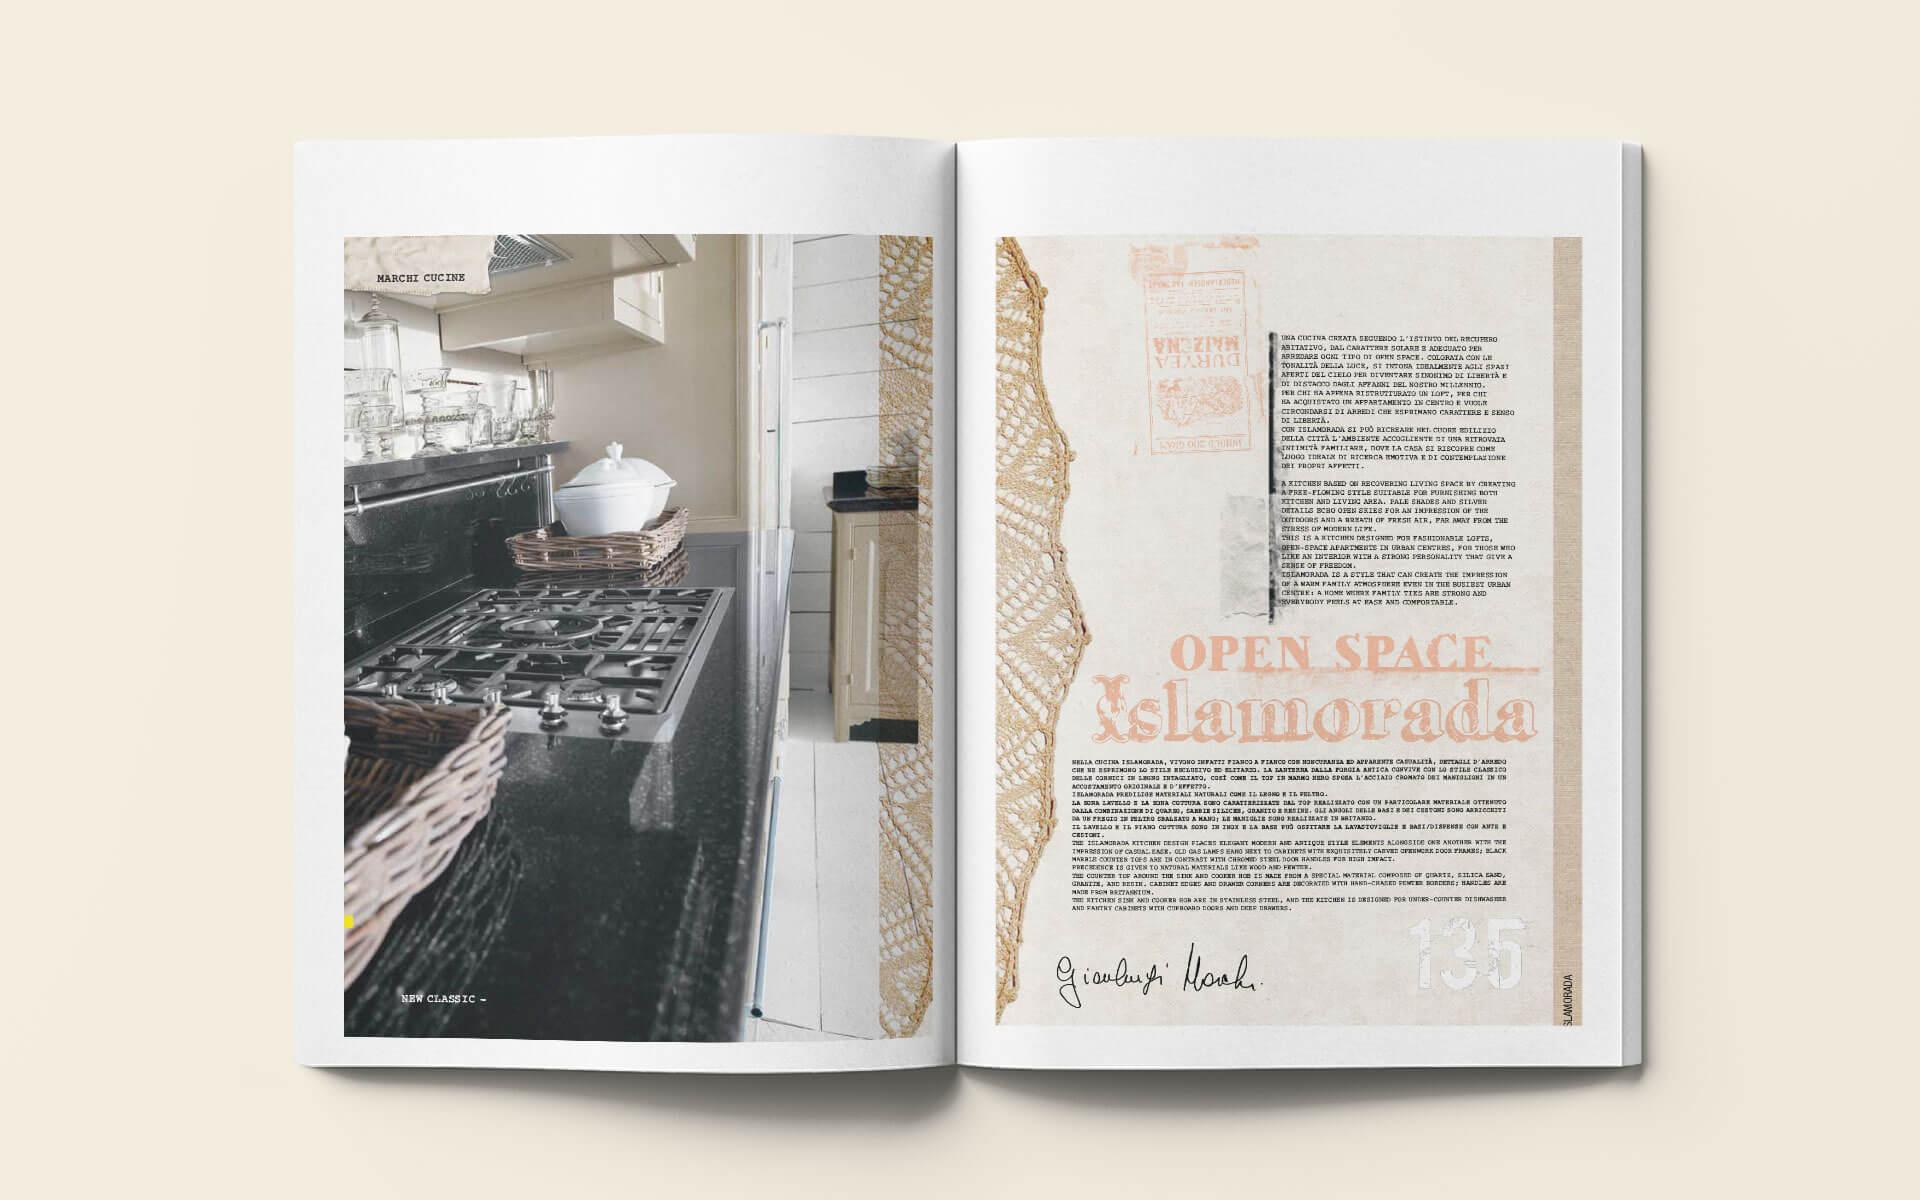 Catalogo Islamorada - Marchi Cucine Made in Italy